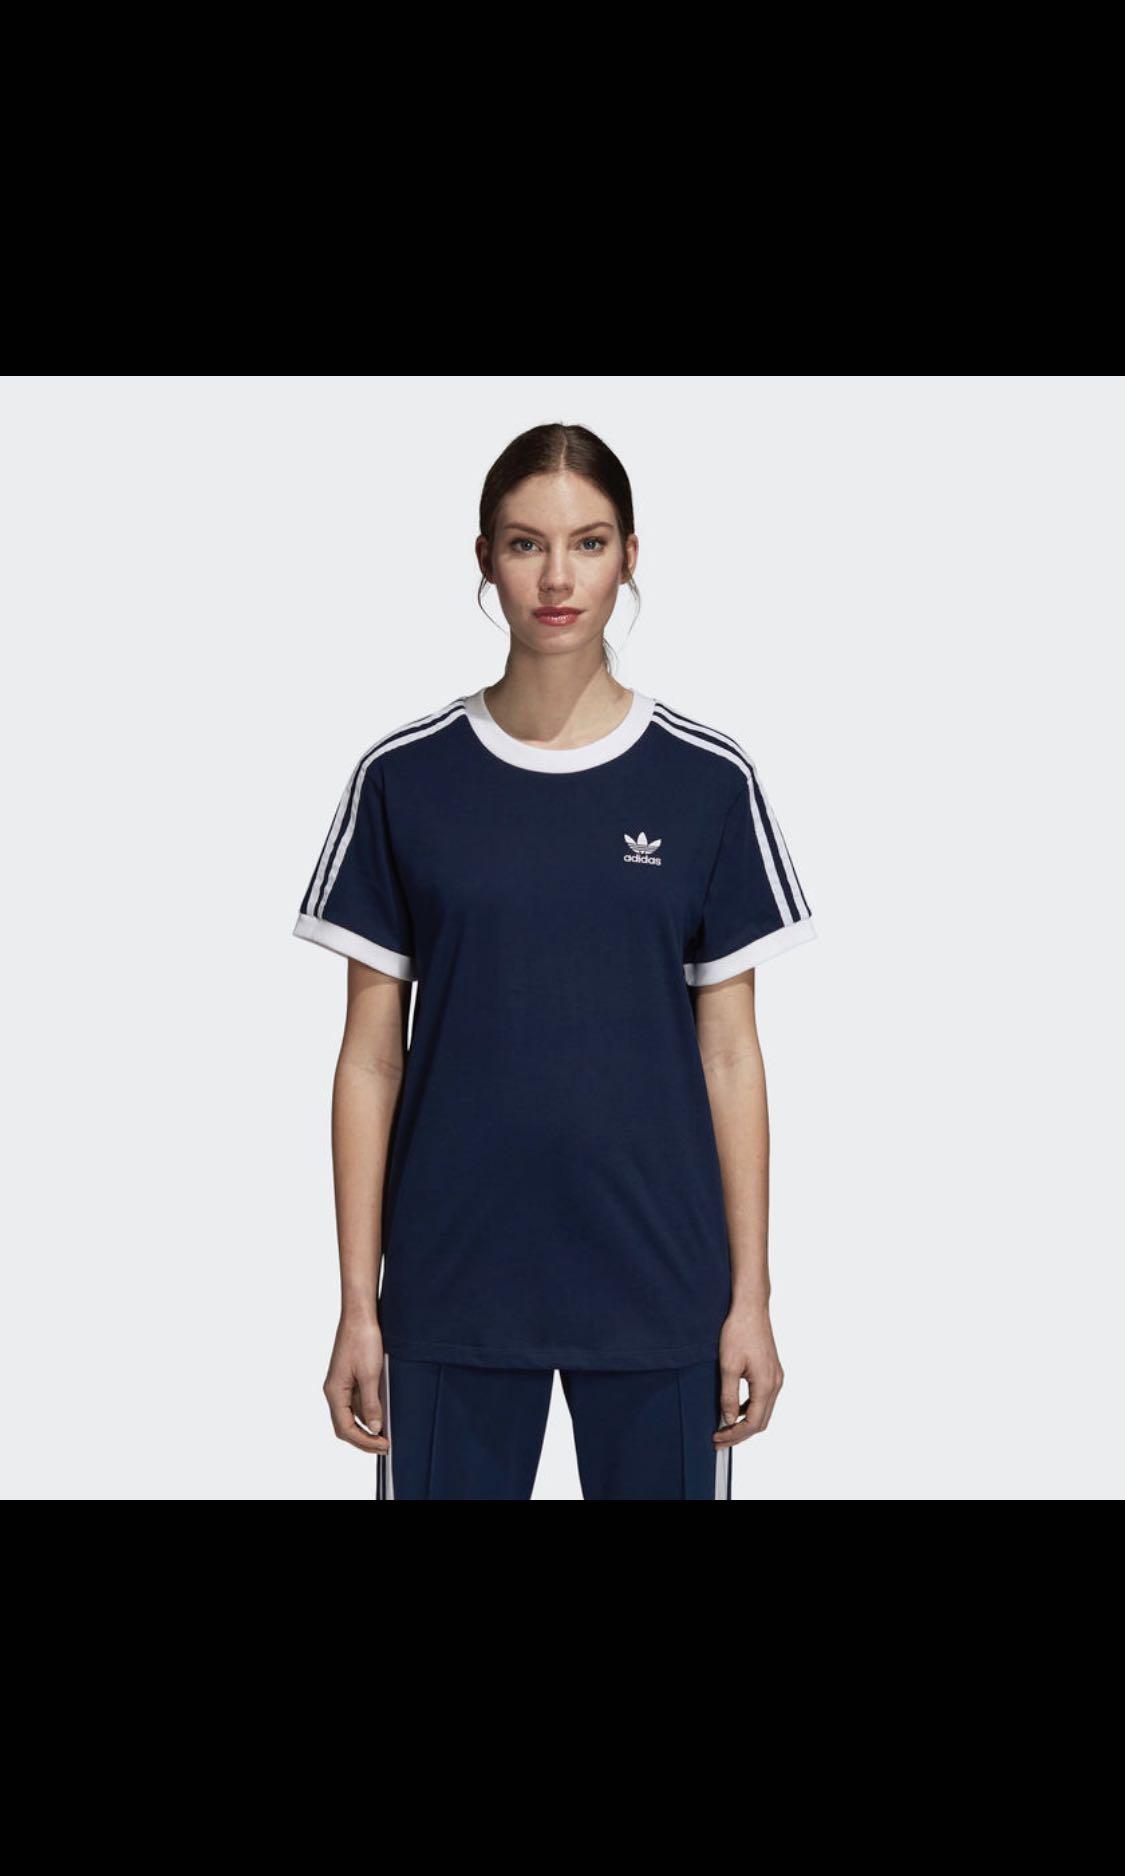 b2941767b3ba Adidas 3-Stripes Tee